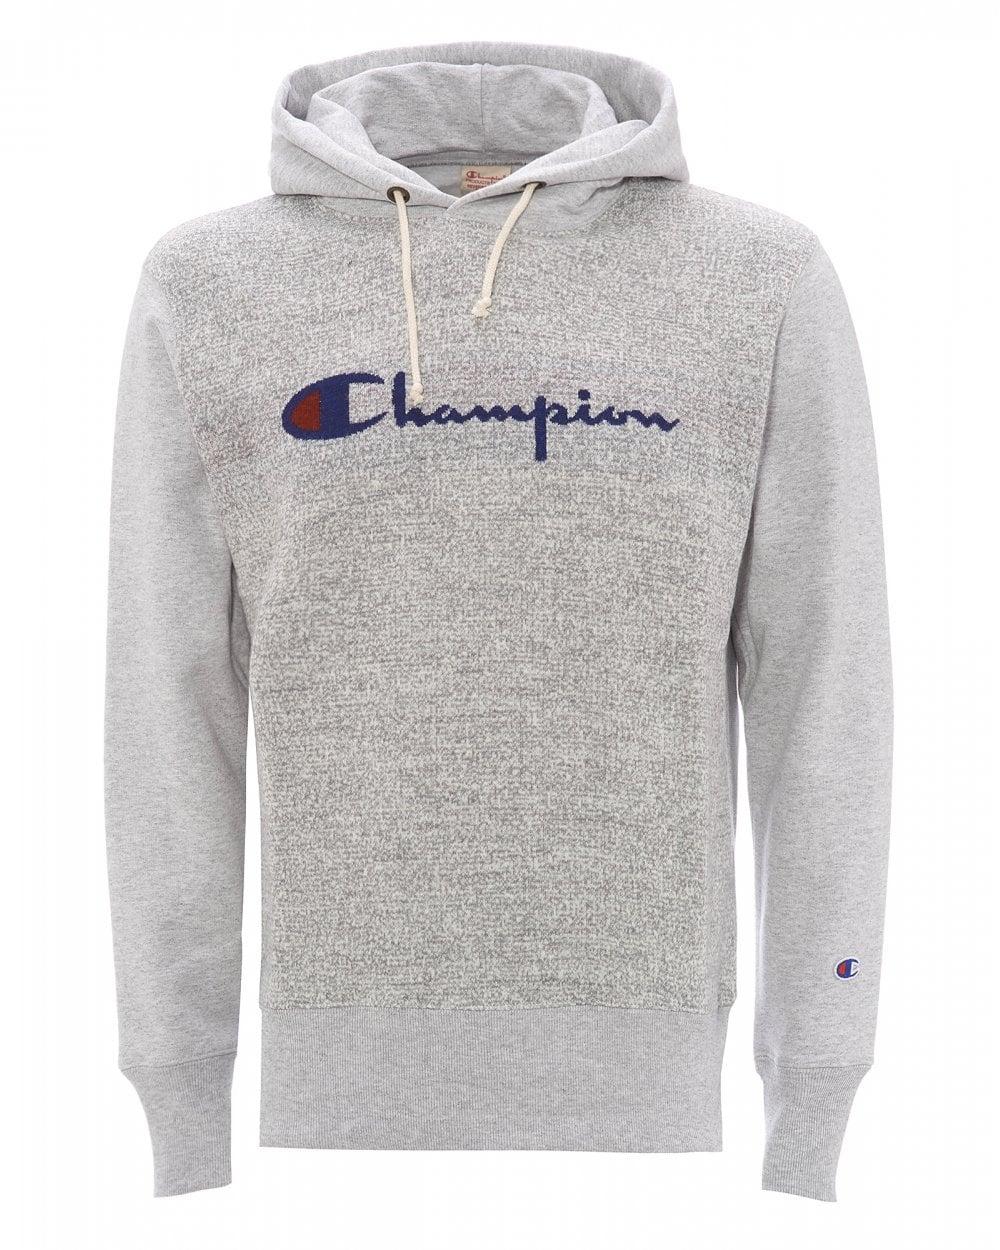 Mens Knit Front Logo Hoodie, Grey Sweatshirt.